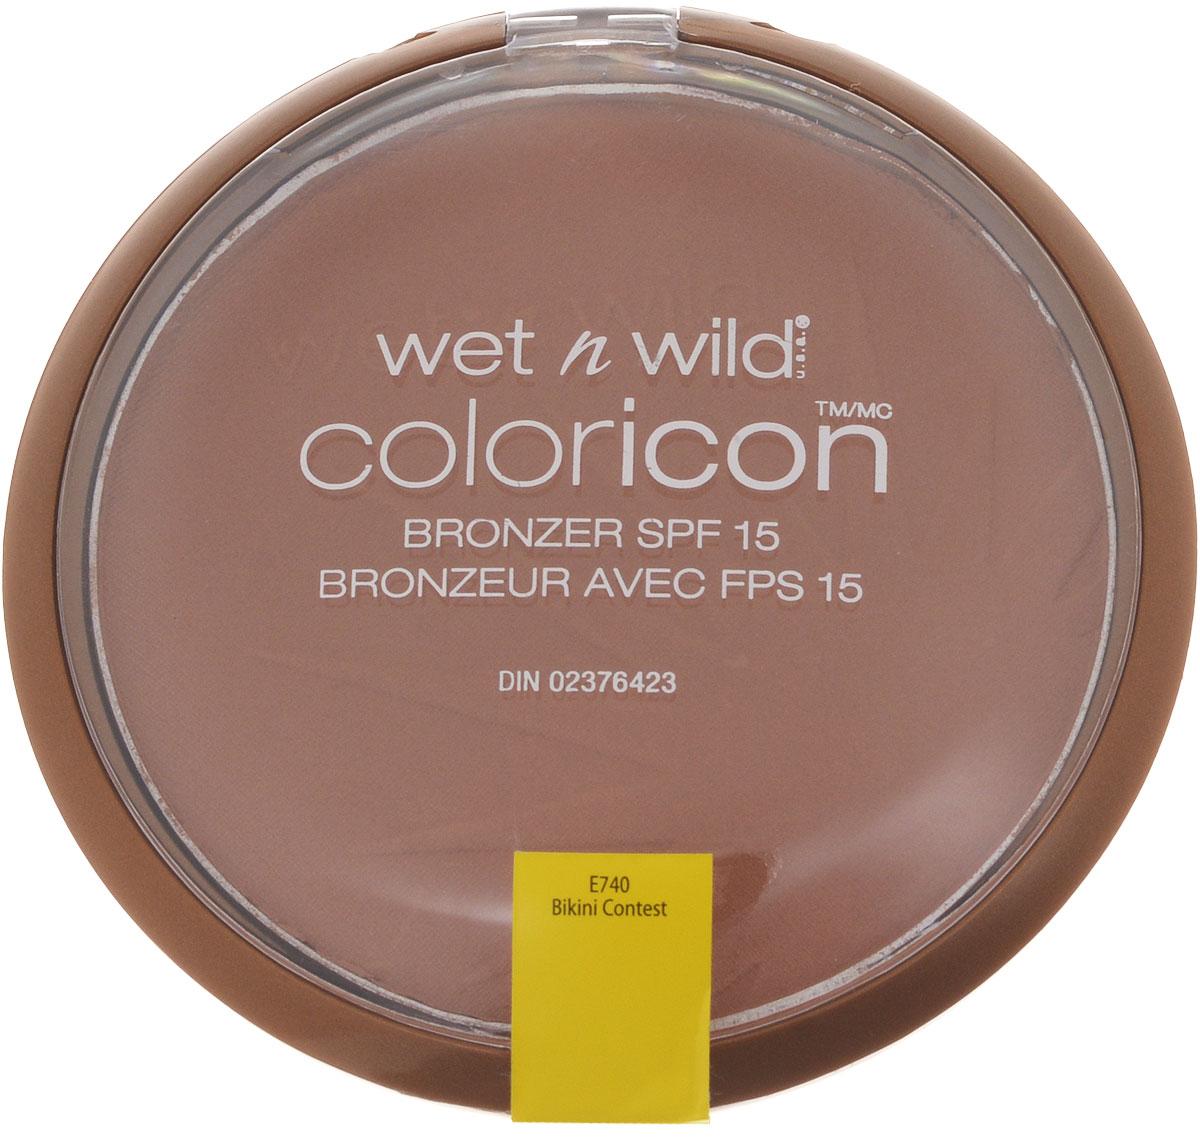 Wet n Wild Компактная Пудра Для Лица Бронзатор Color Icon Bronzer bikini contest 13 гр wet n wild воск для бровей color icon brow shaper e631 a clear conscience